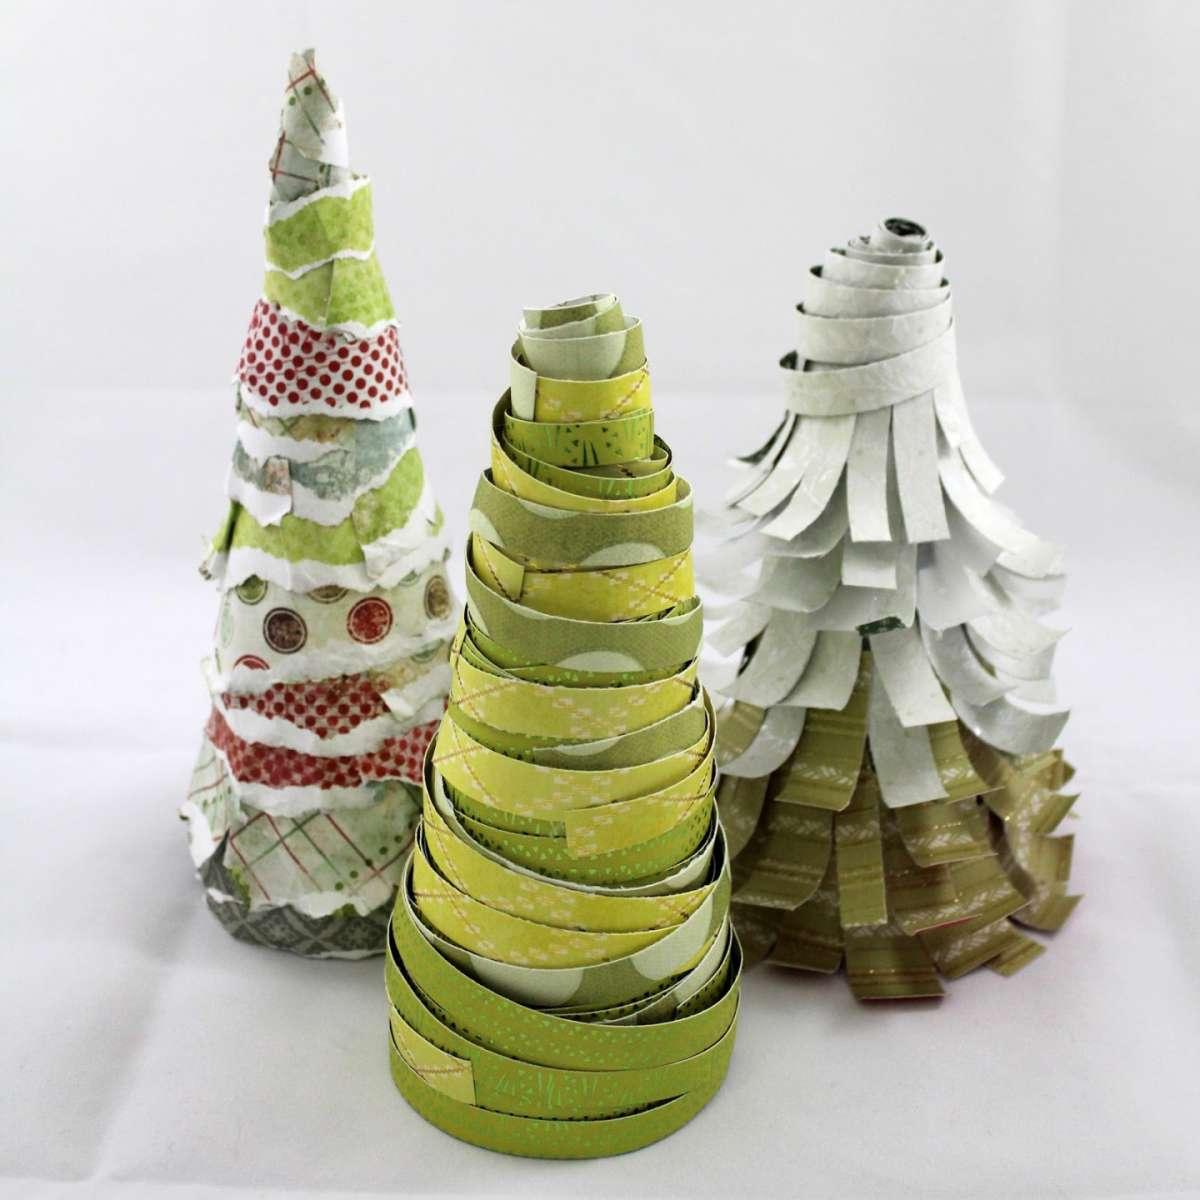 Alberi Di Natale Di Carta.Alberi Di Natale Di Carta Dal Giornale Agli Origami